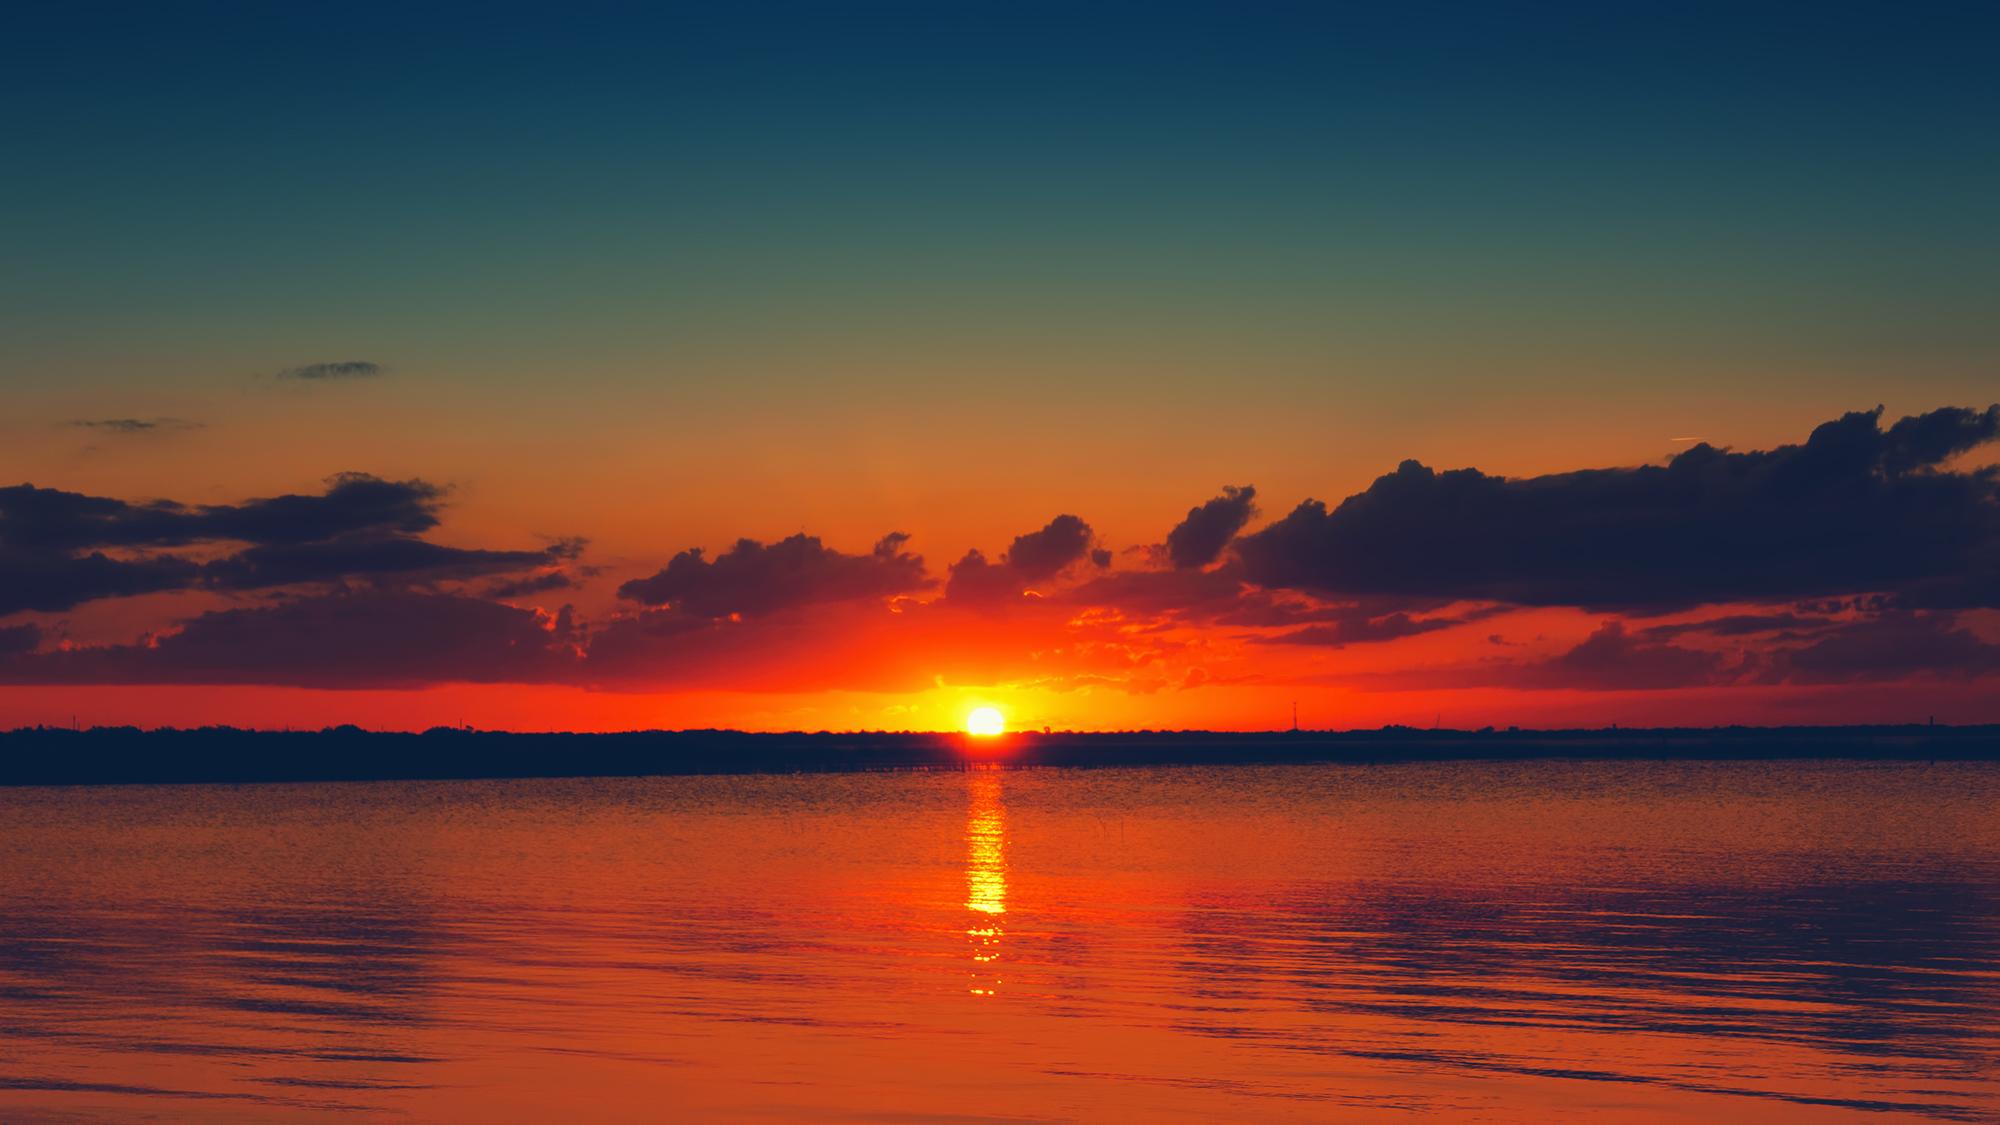 Orange and Blue Sunset in Florida